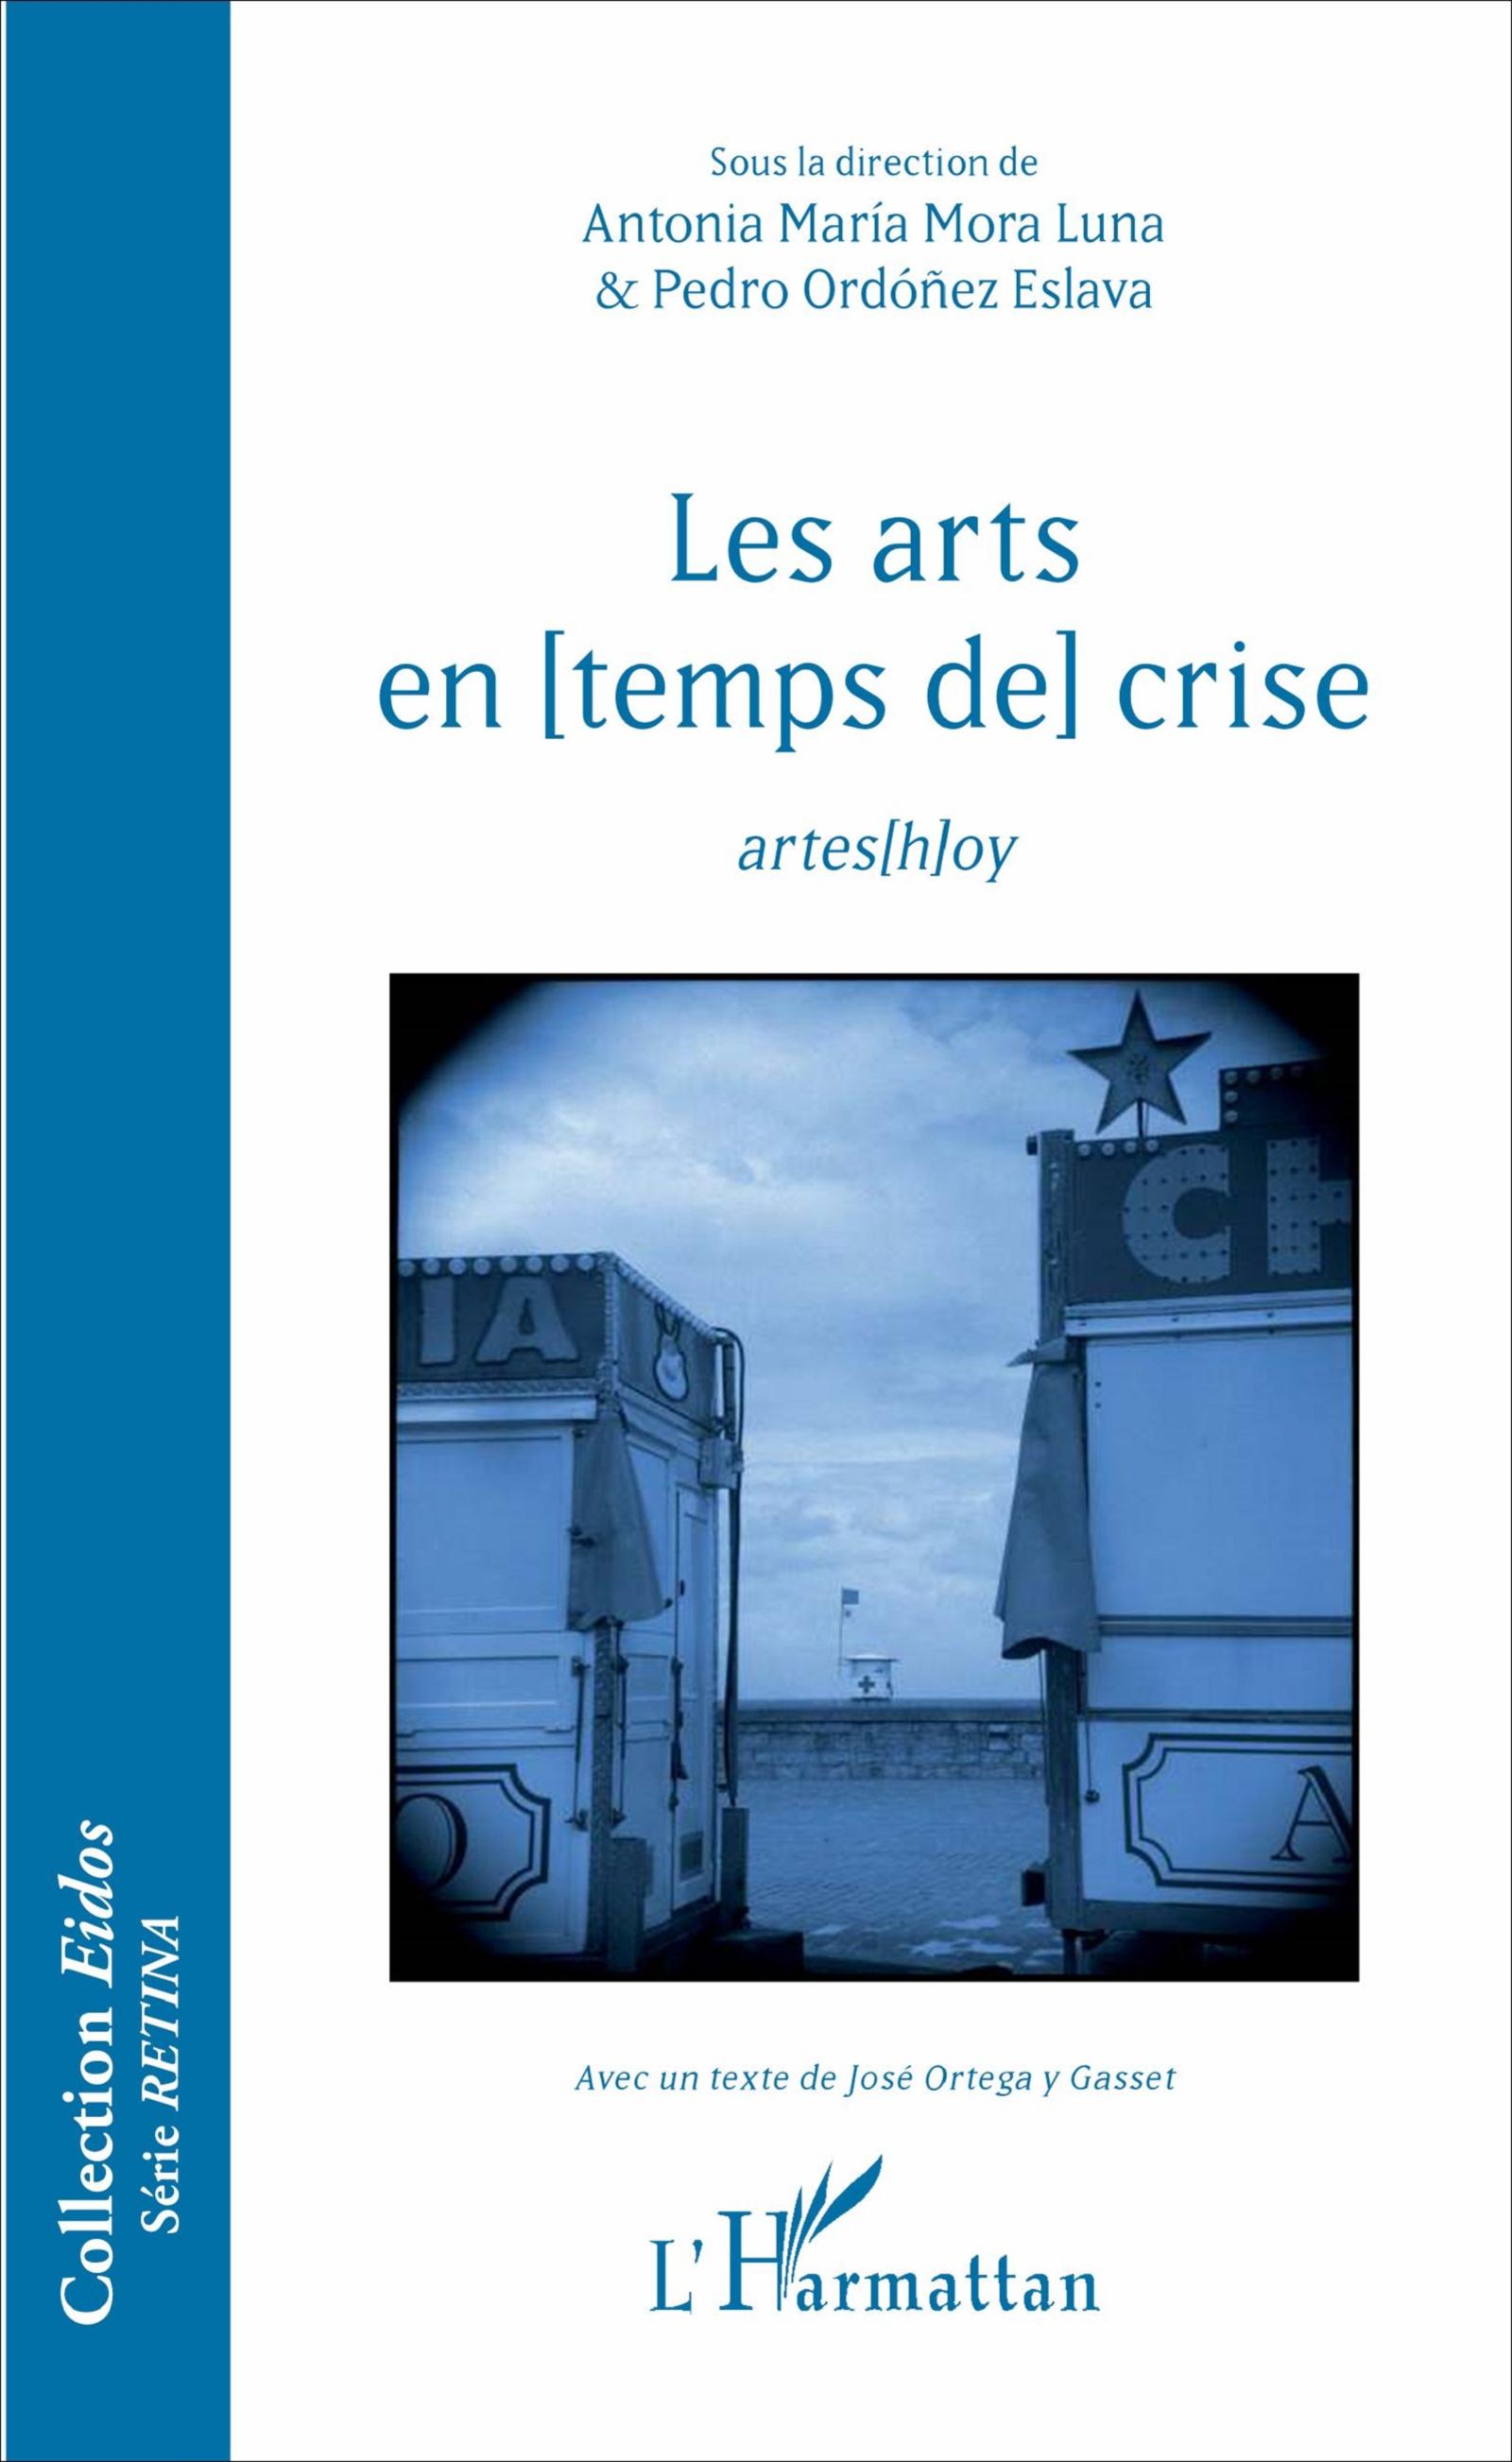 LES ARTS EN [TEMPS DE] CRISE